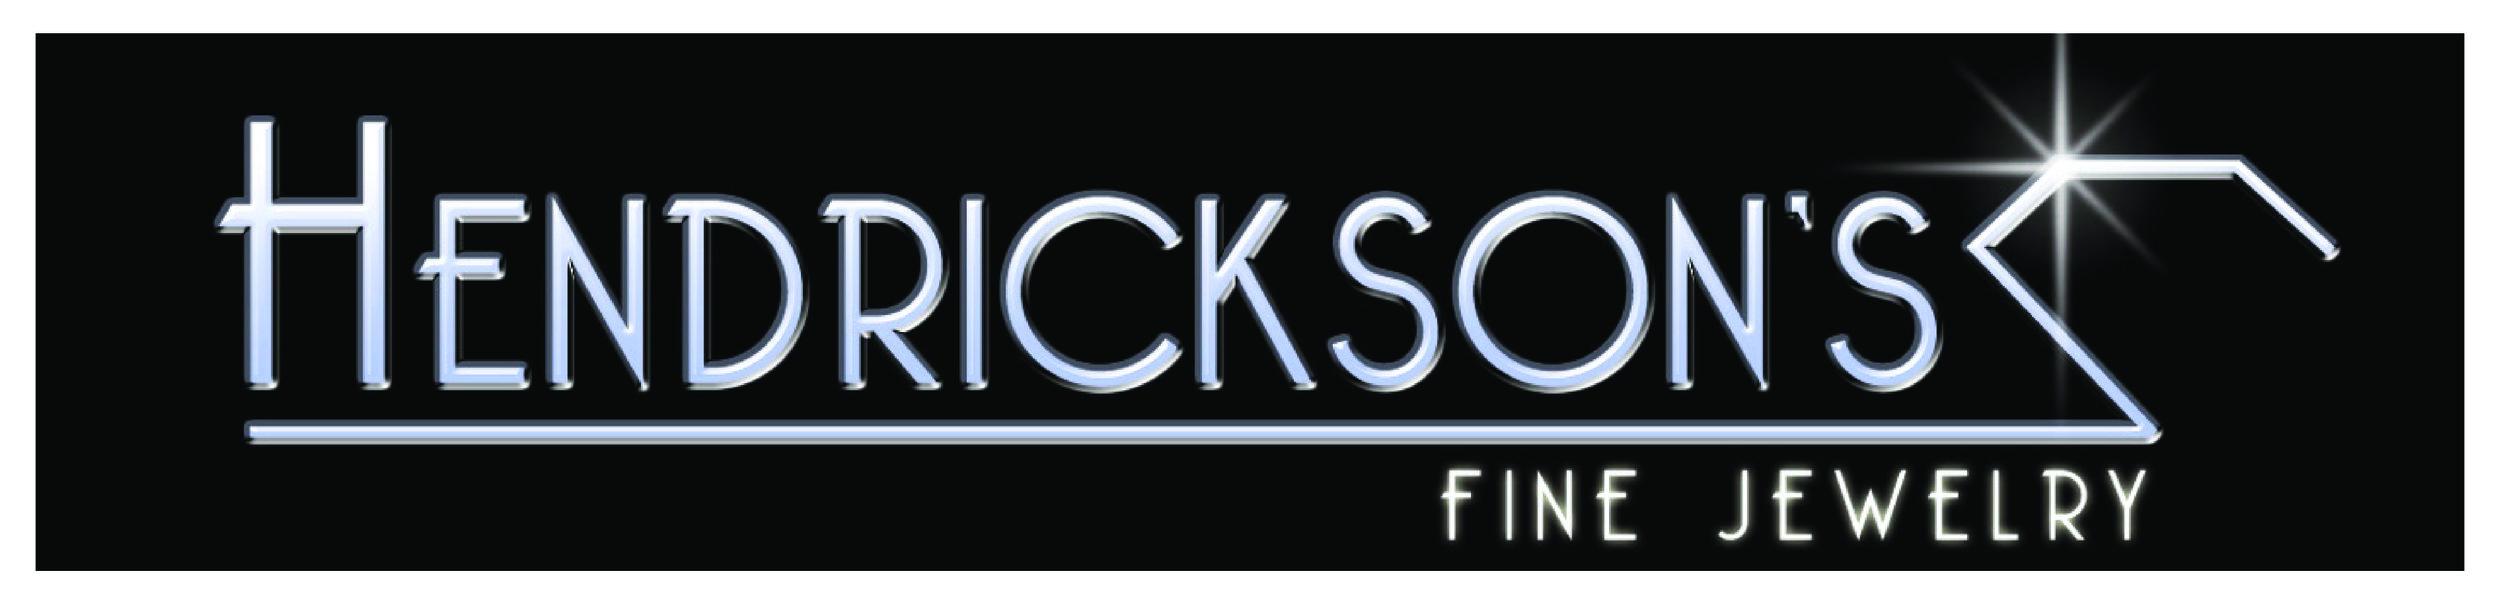 Hendricksons Fine Jewelry Logo-01 (1).jpg